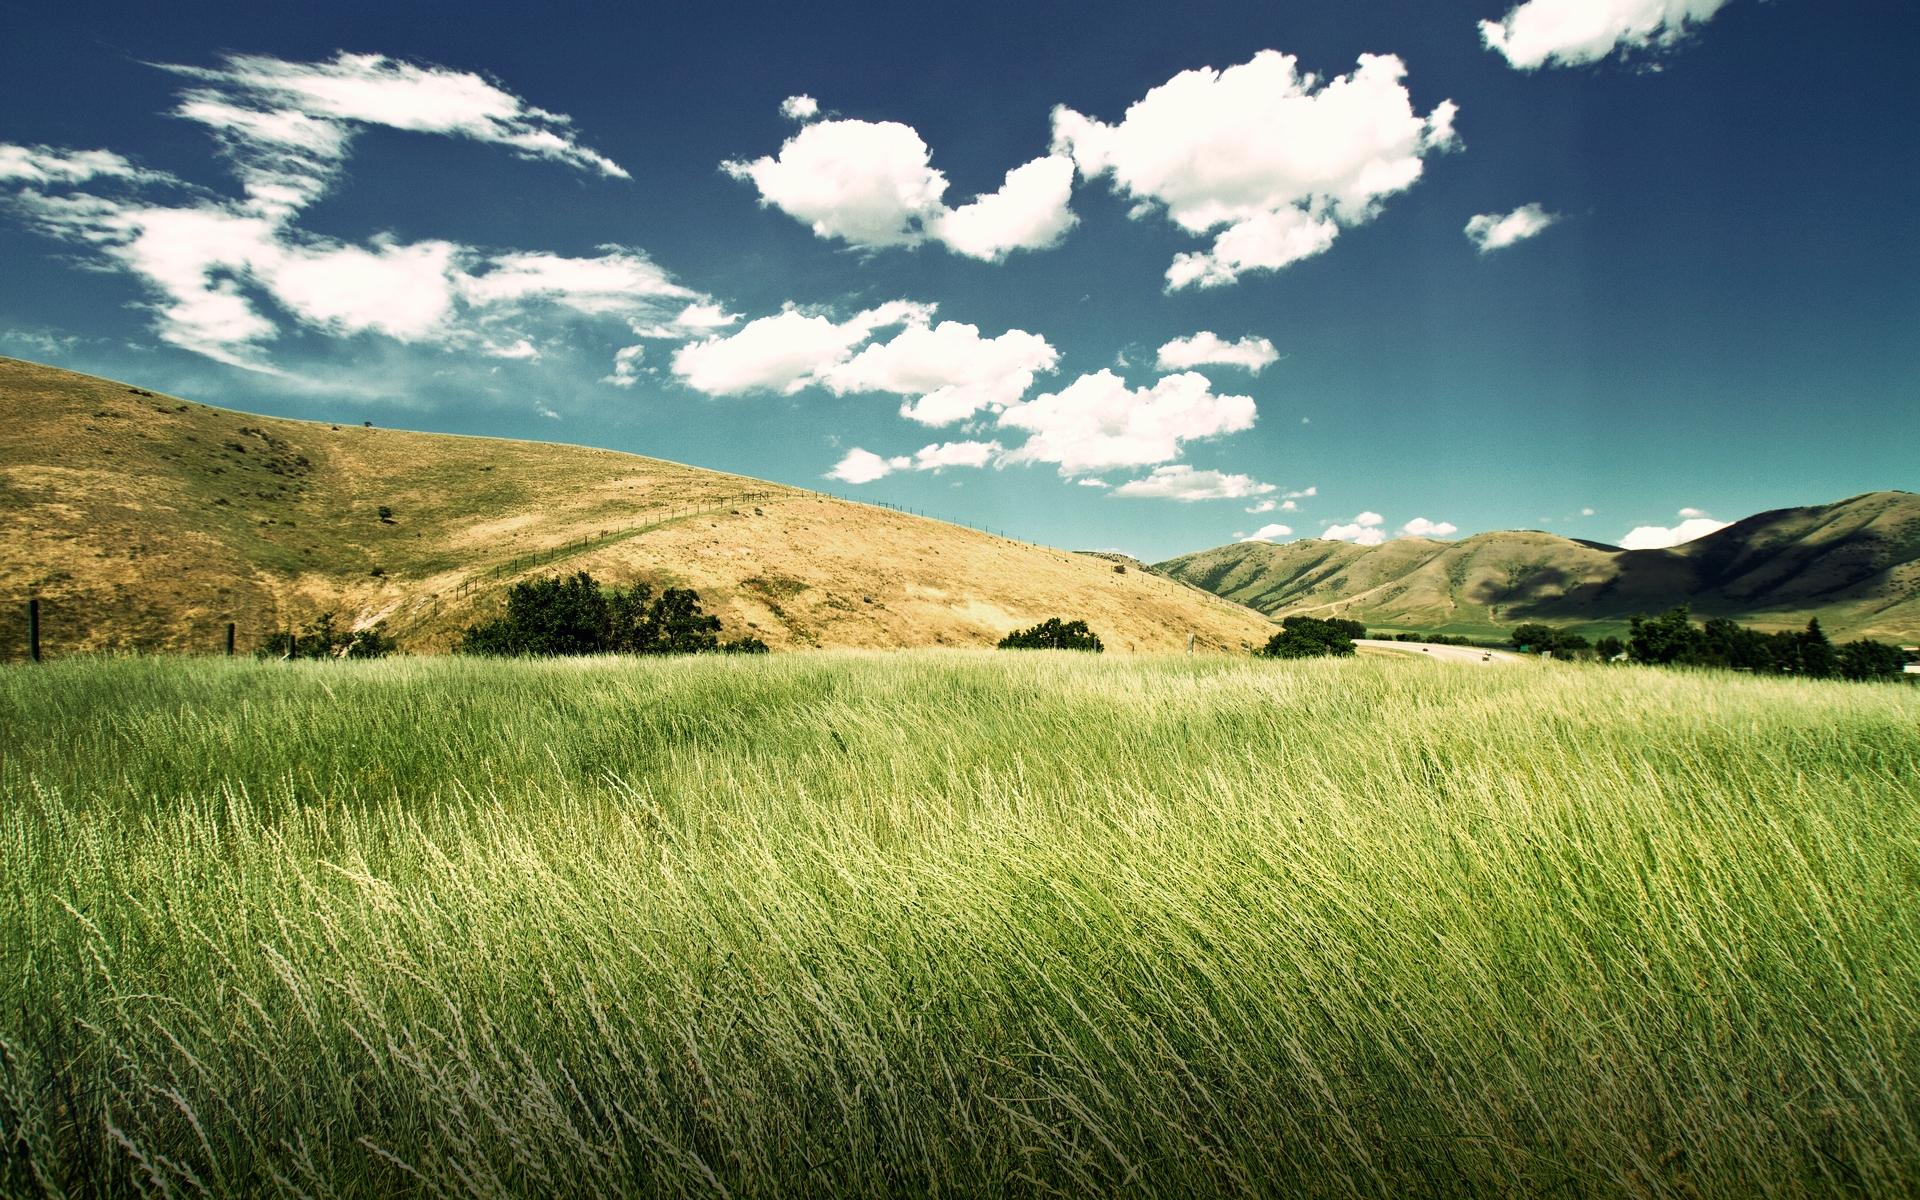 Green Valley Wide Desktop Background wallpaper